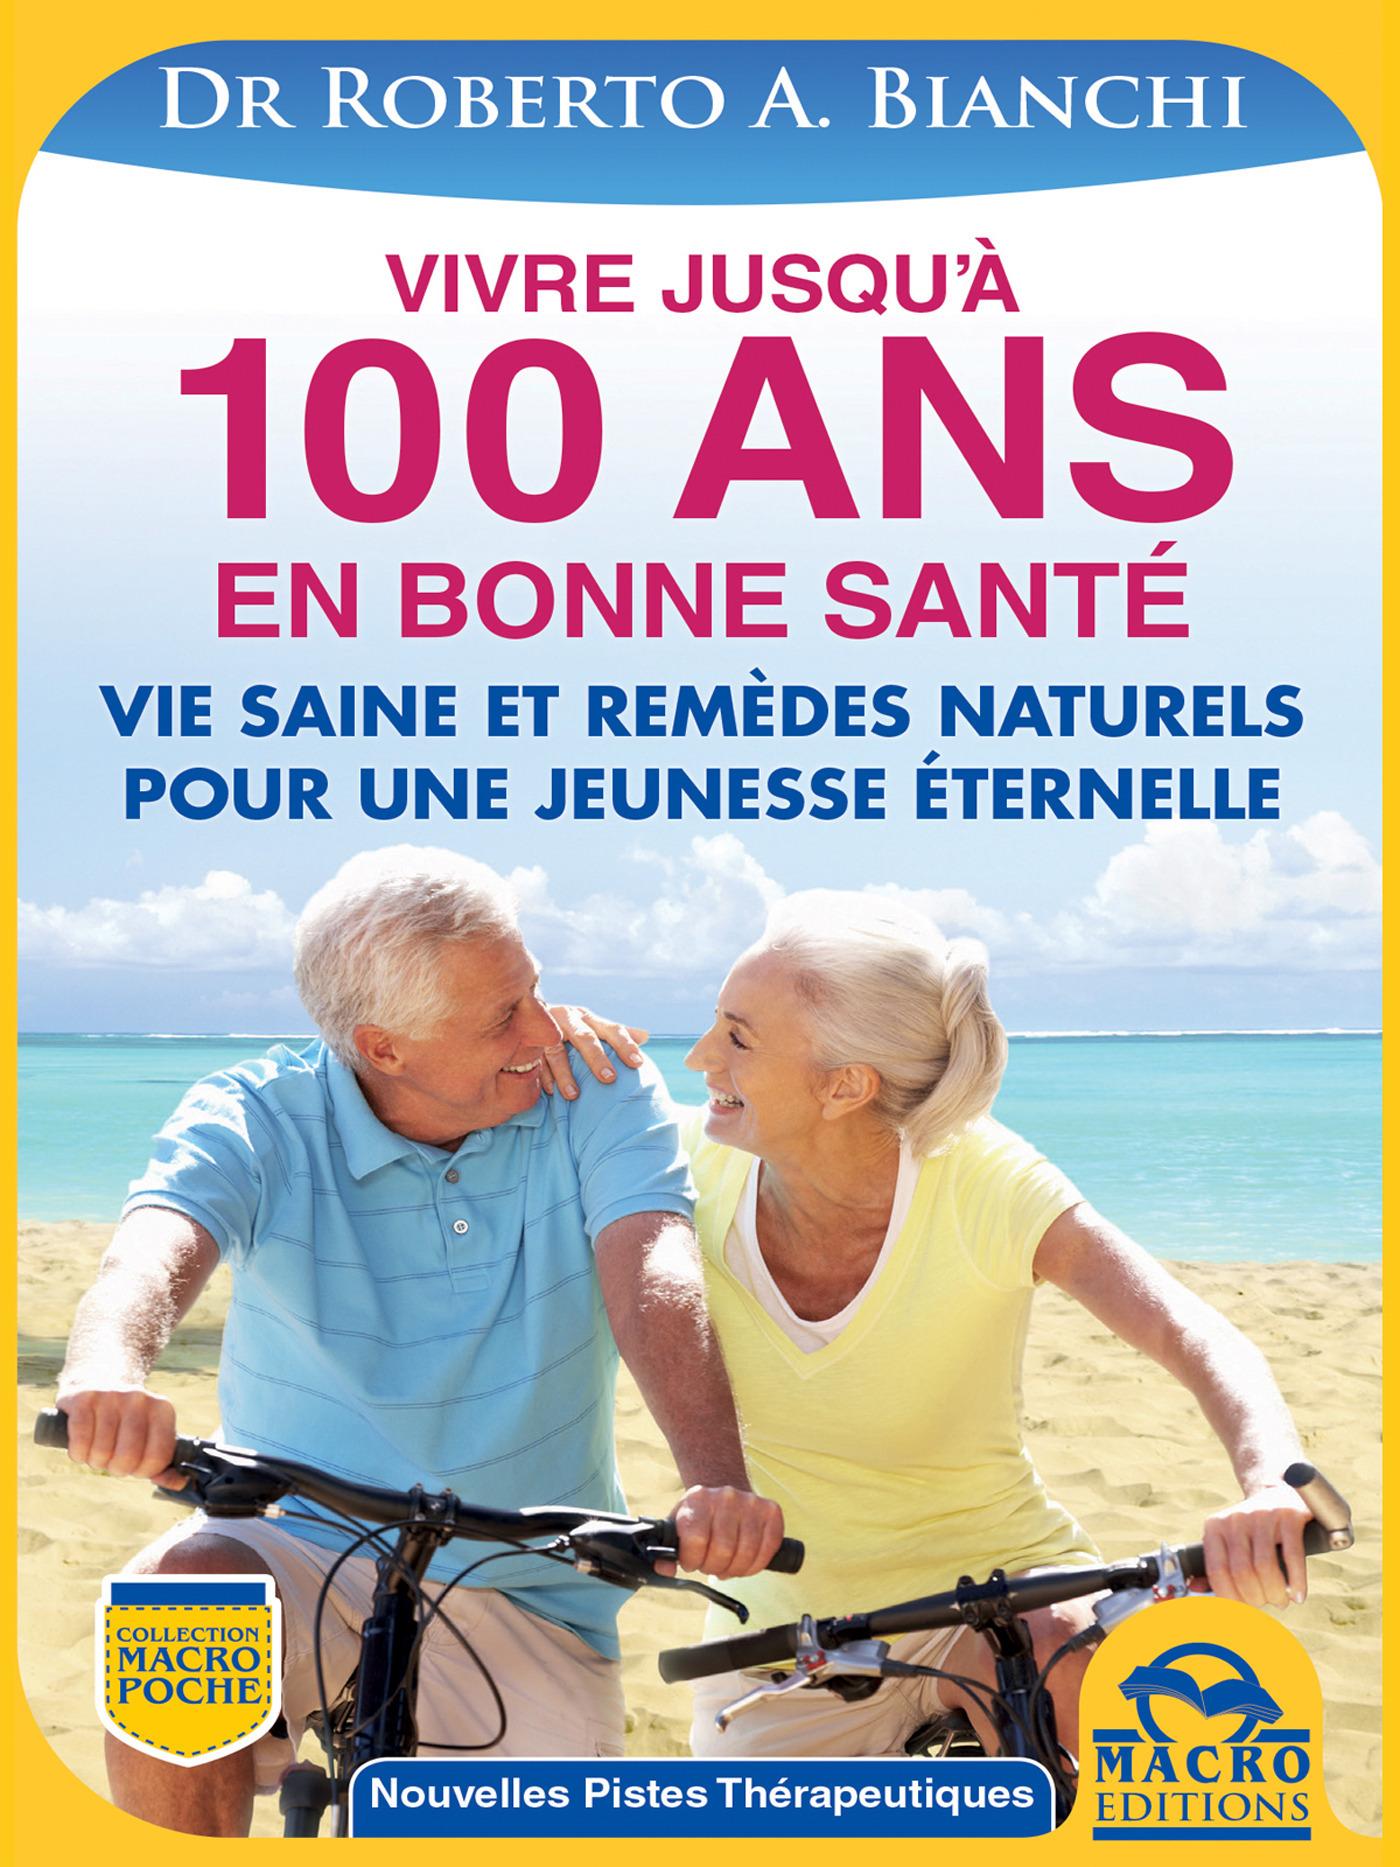 Vivre jusqu'à 100 ANS en bonne santé  - Roberto A. Bianchi  - Roberto Bianchi